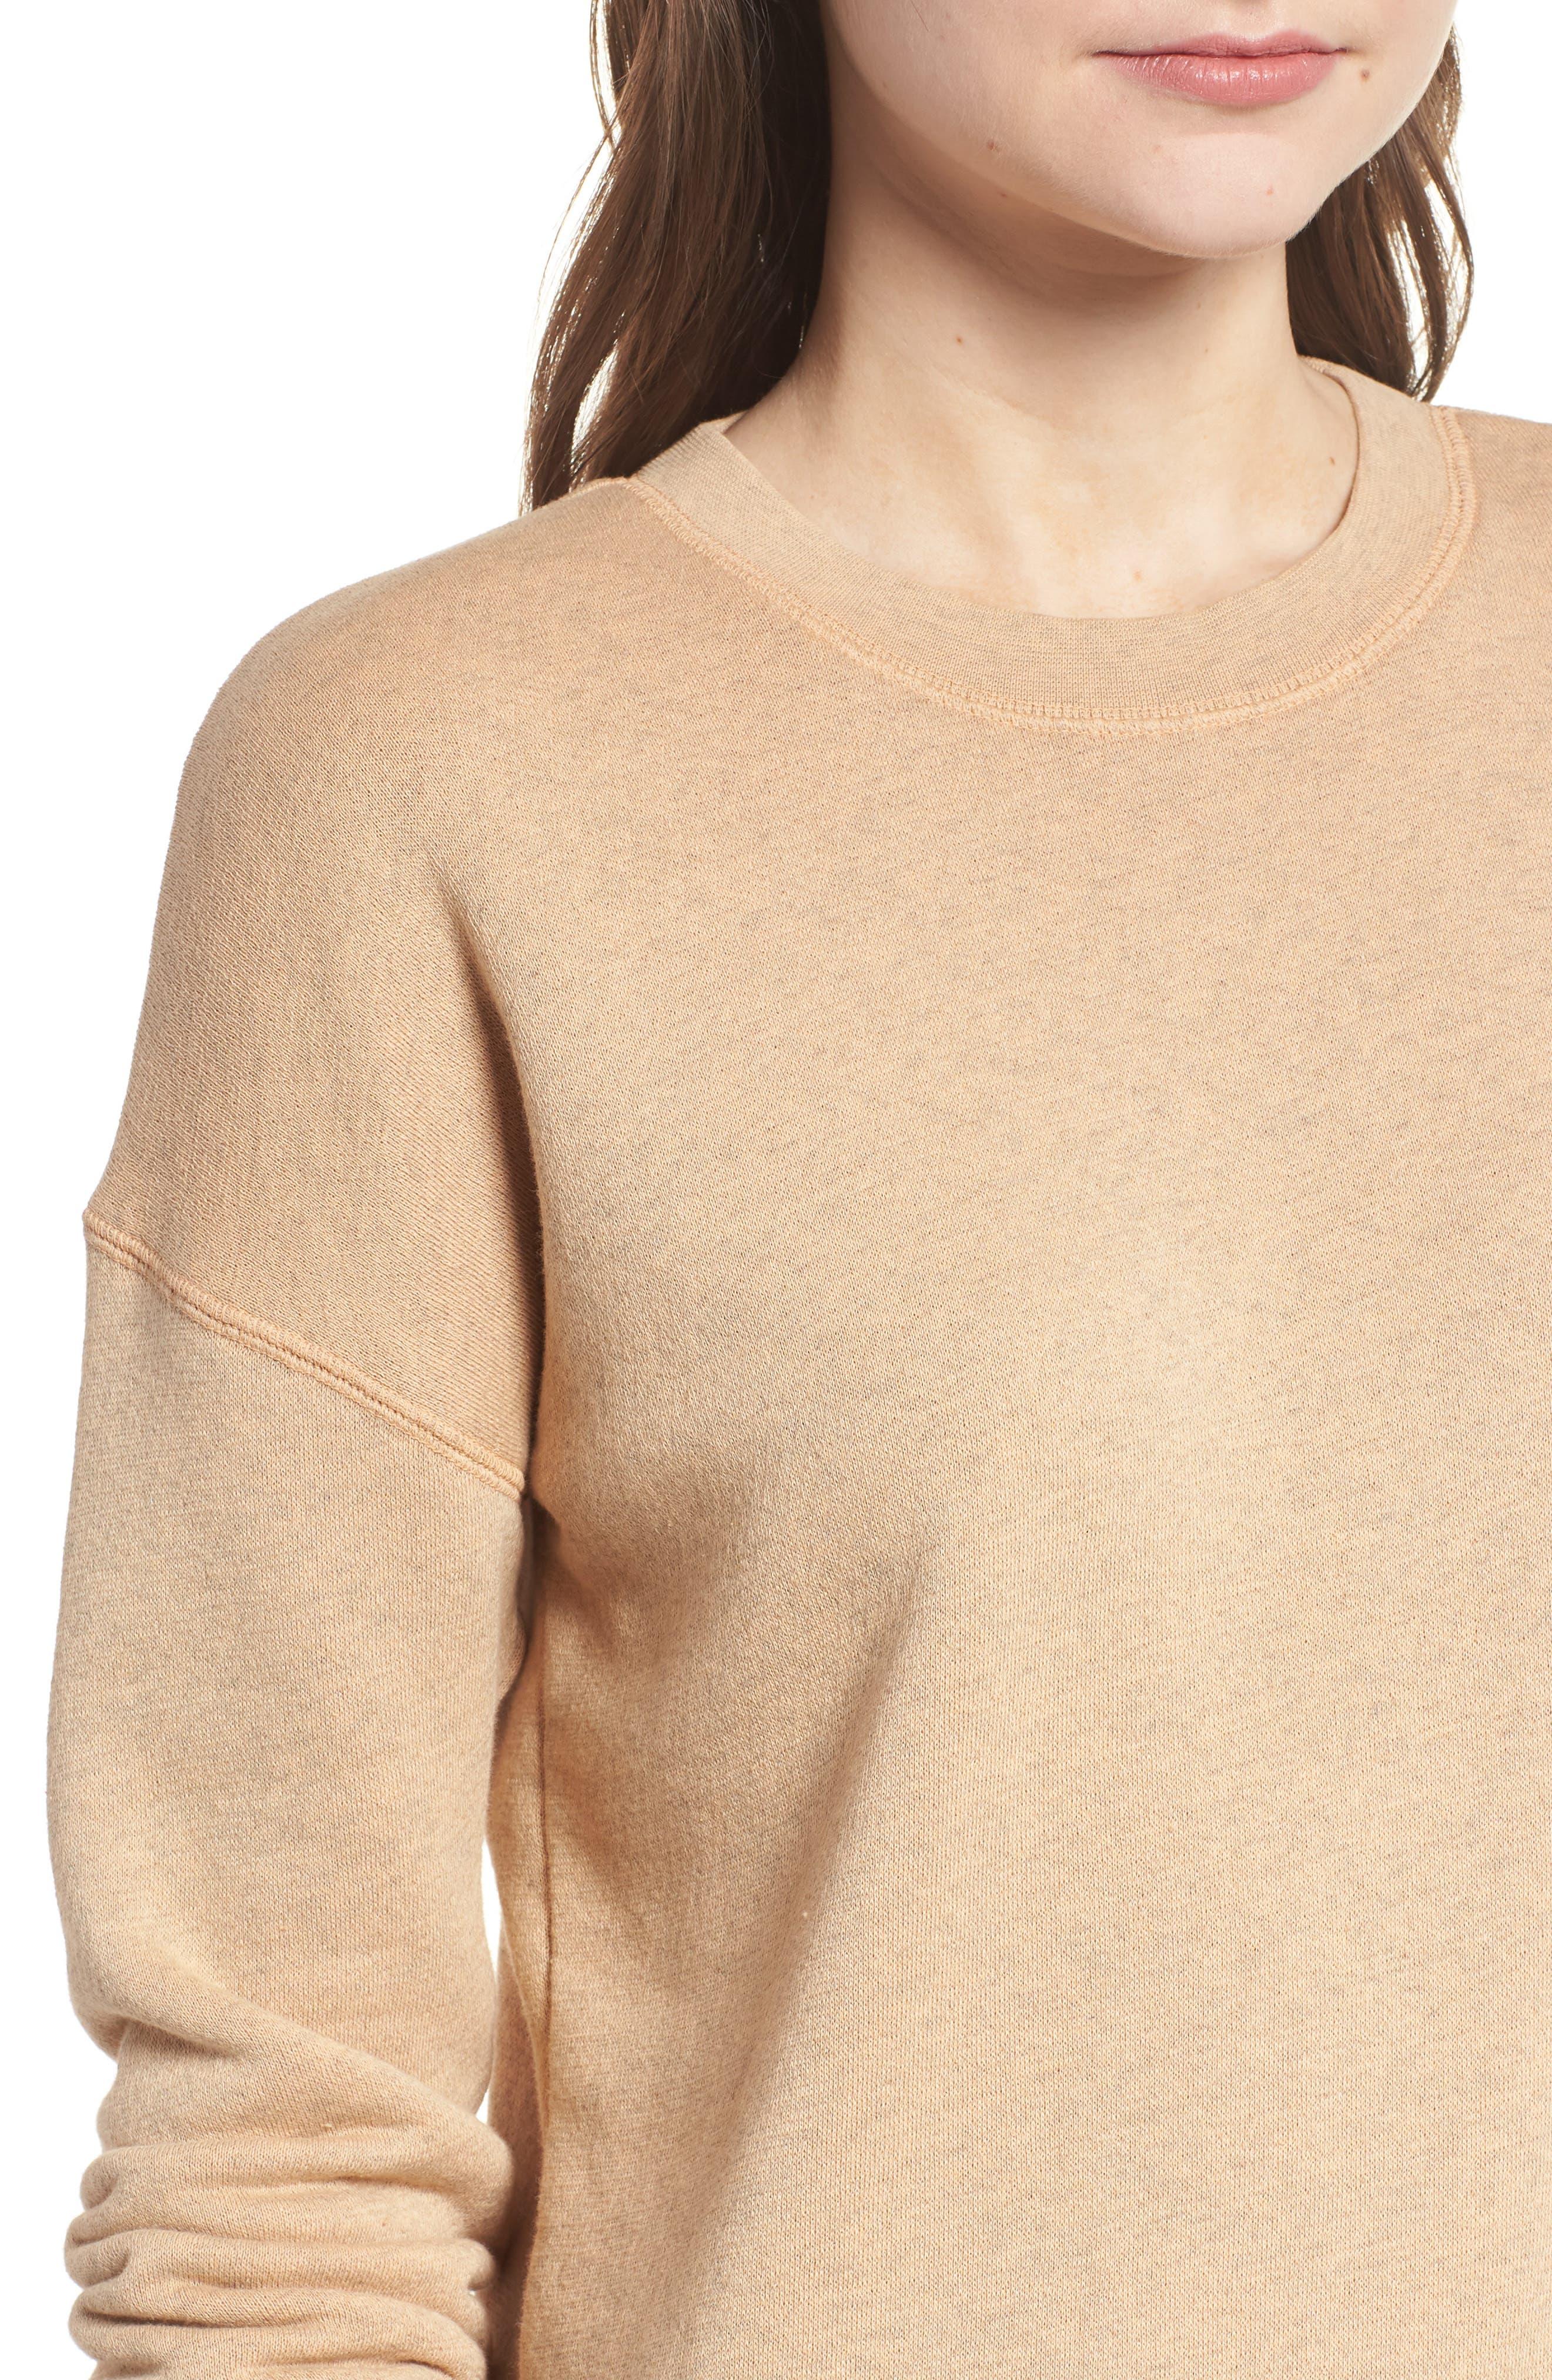 Mainstay Sweatshirt,                             Alternate thumbnail 4, color,                             Hthr Dune